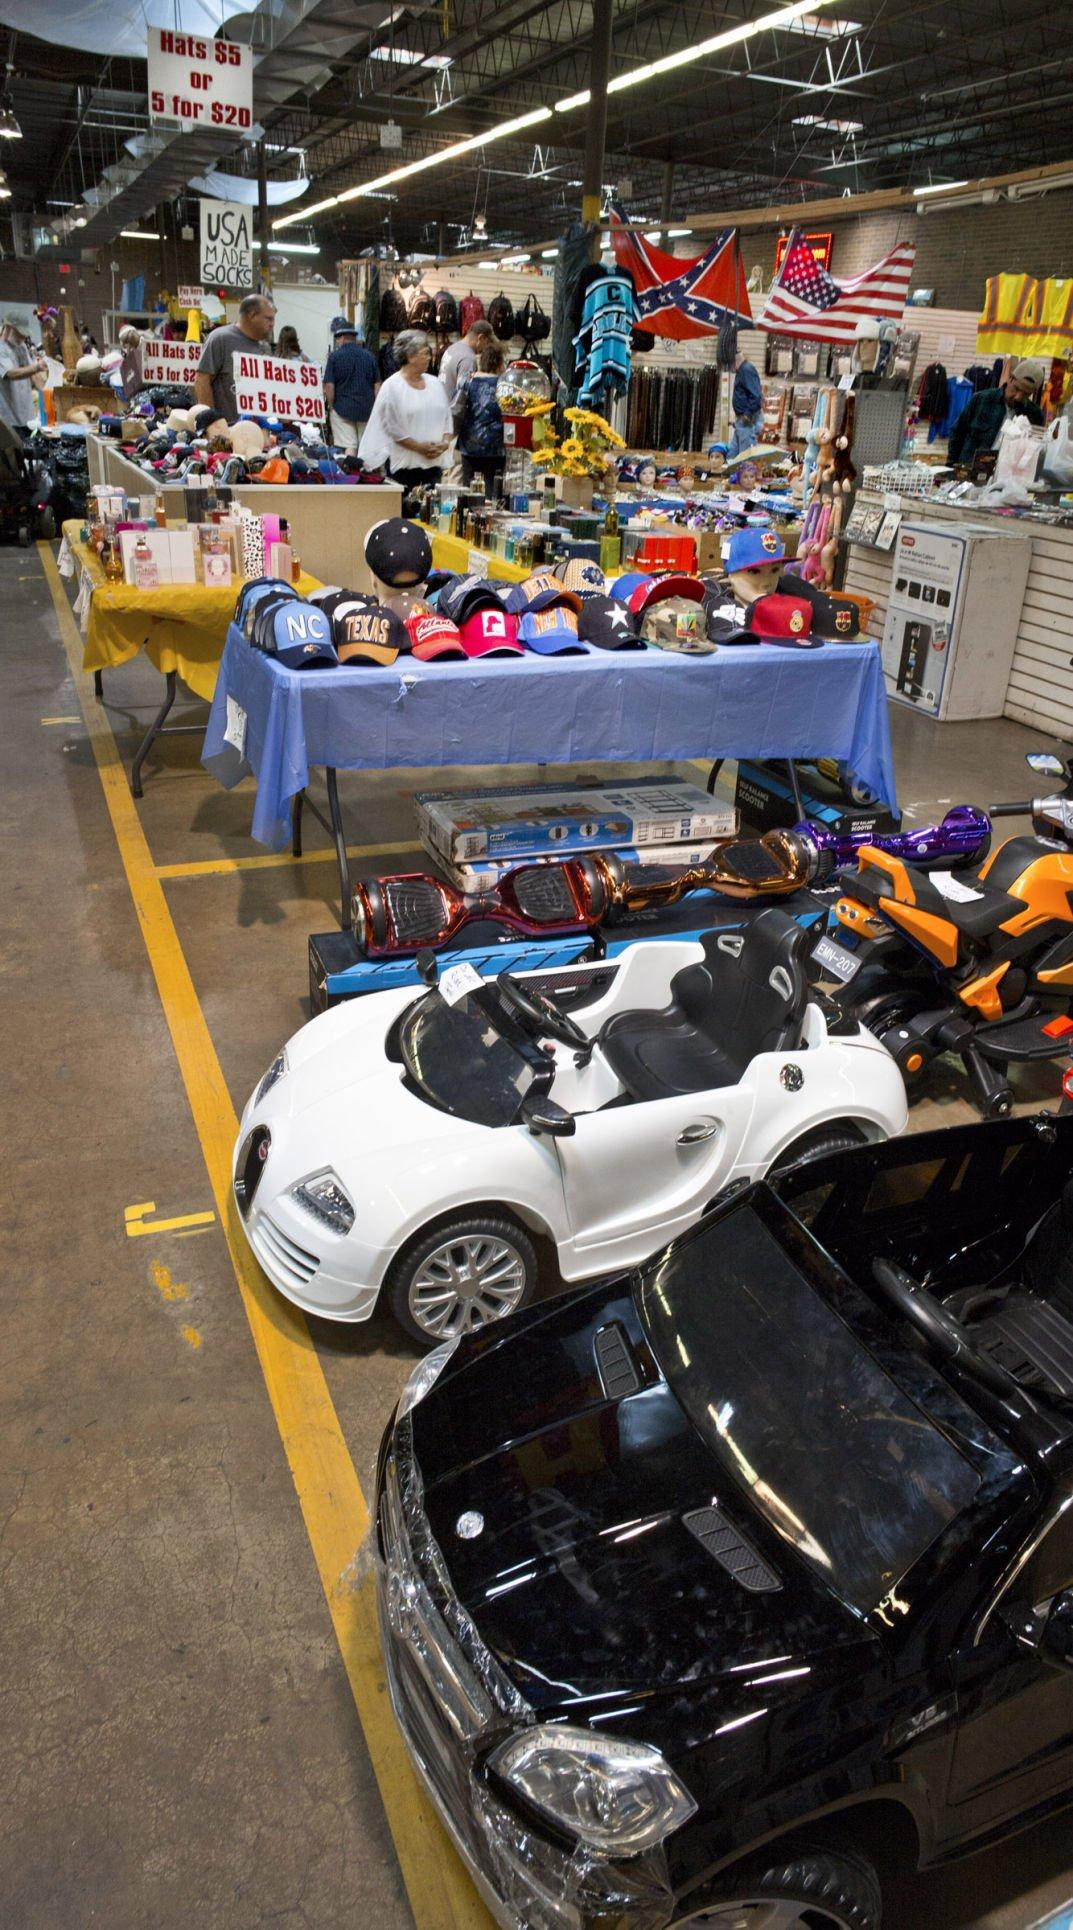 Cooks Flea Market Sold To United Flea Markets Local News - Usa flea market car show